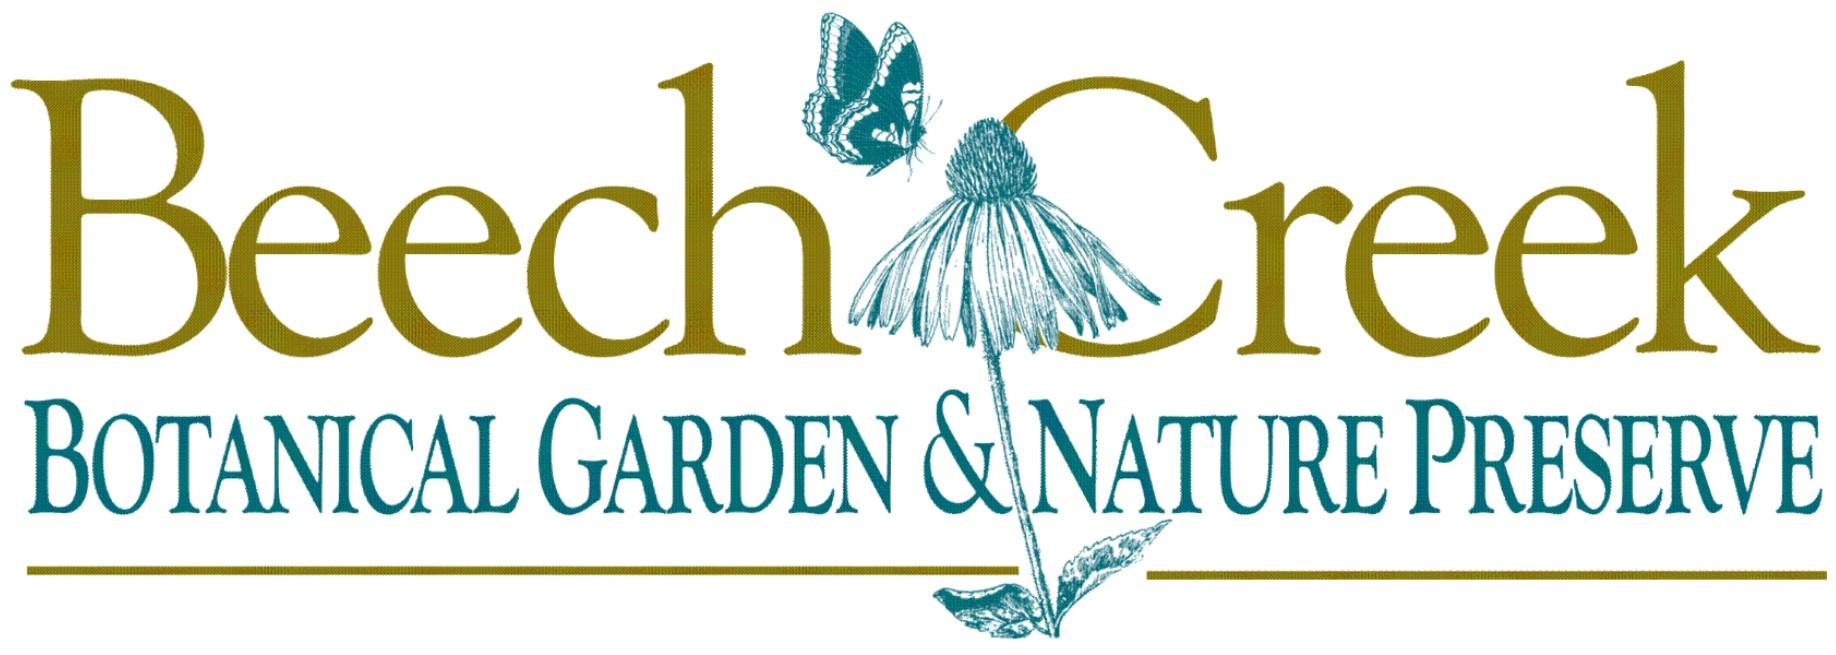 Beech Creek Garden Logo